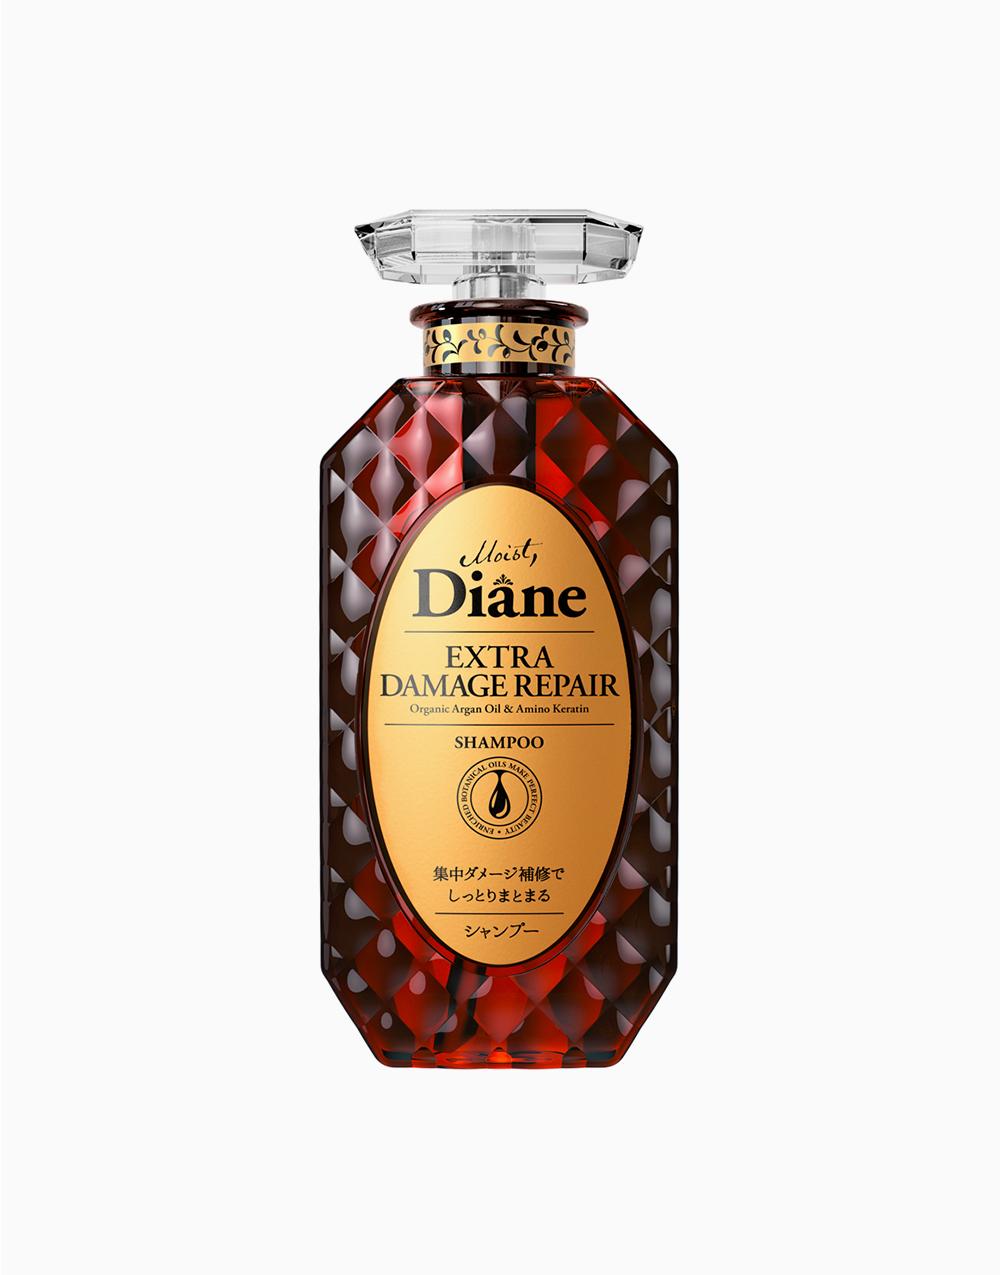 Extra Damage Repair Shampoo by Moist Diane